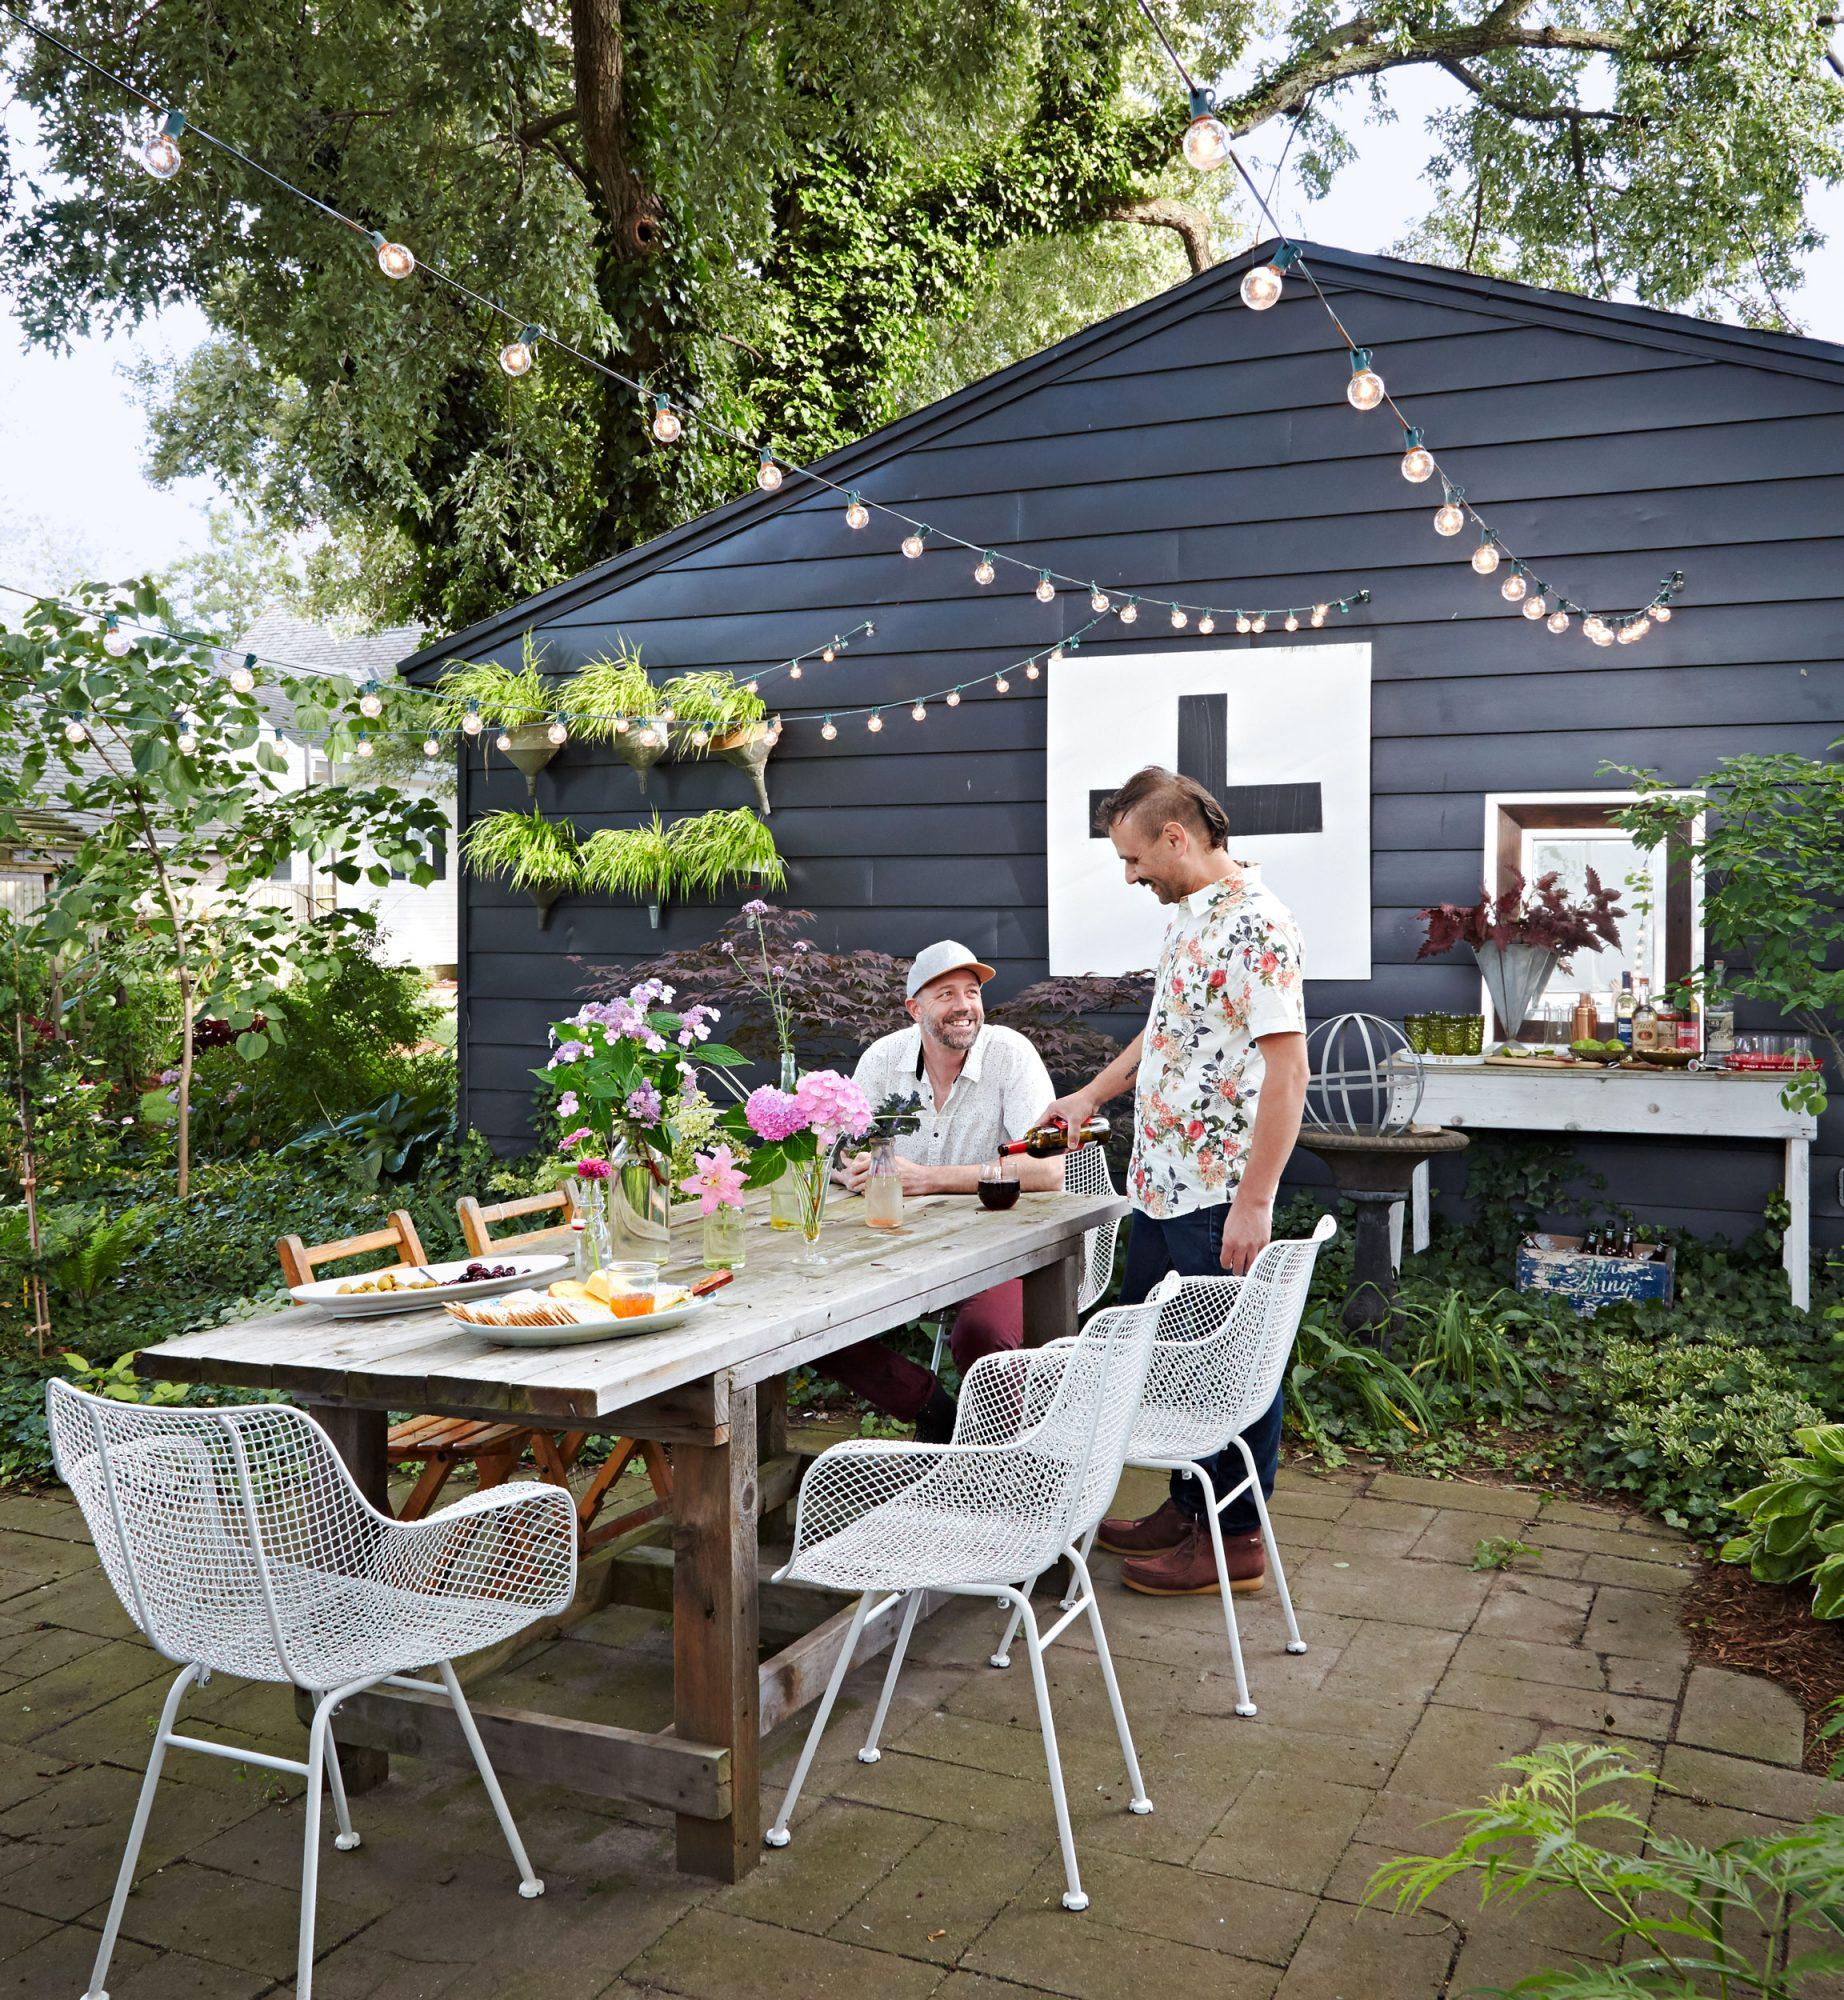 Backyard Dining at Boyles home